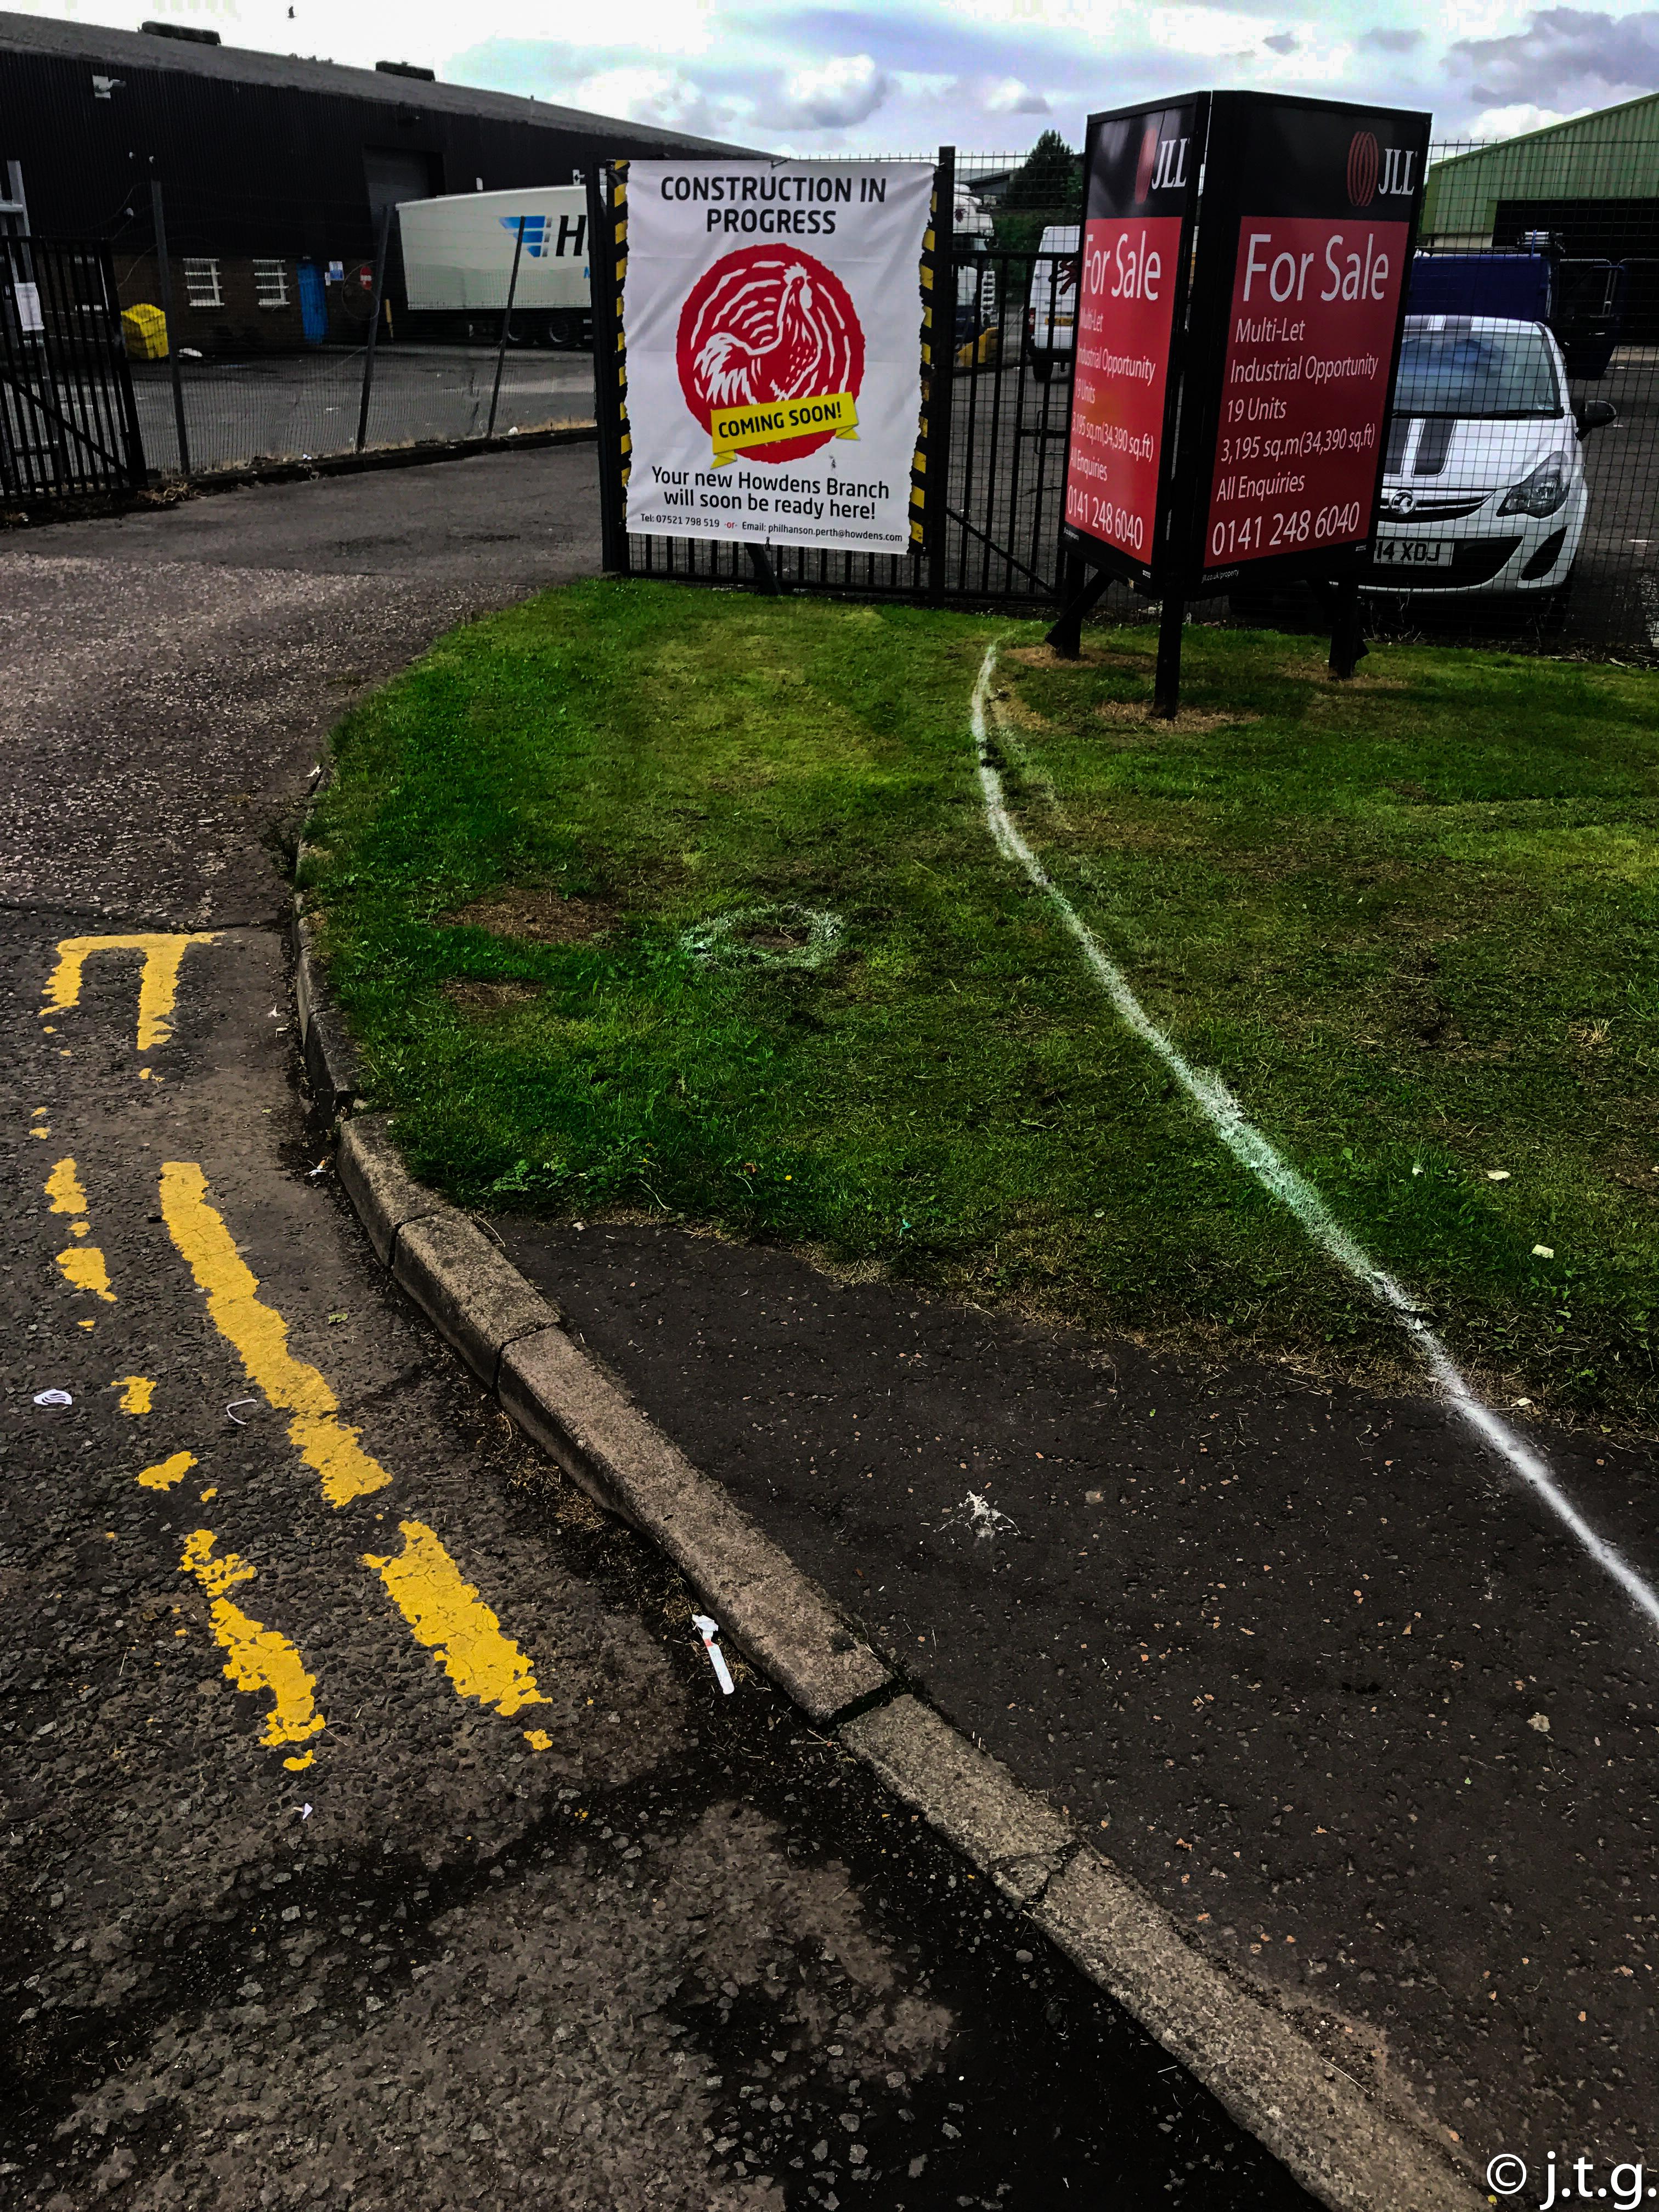 entrance ways and drop curbs